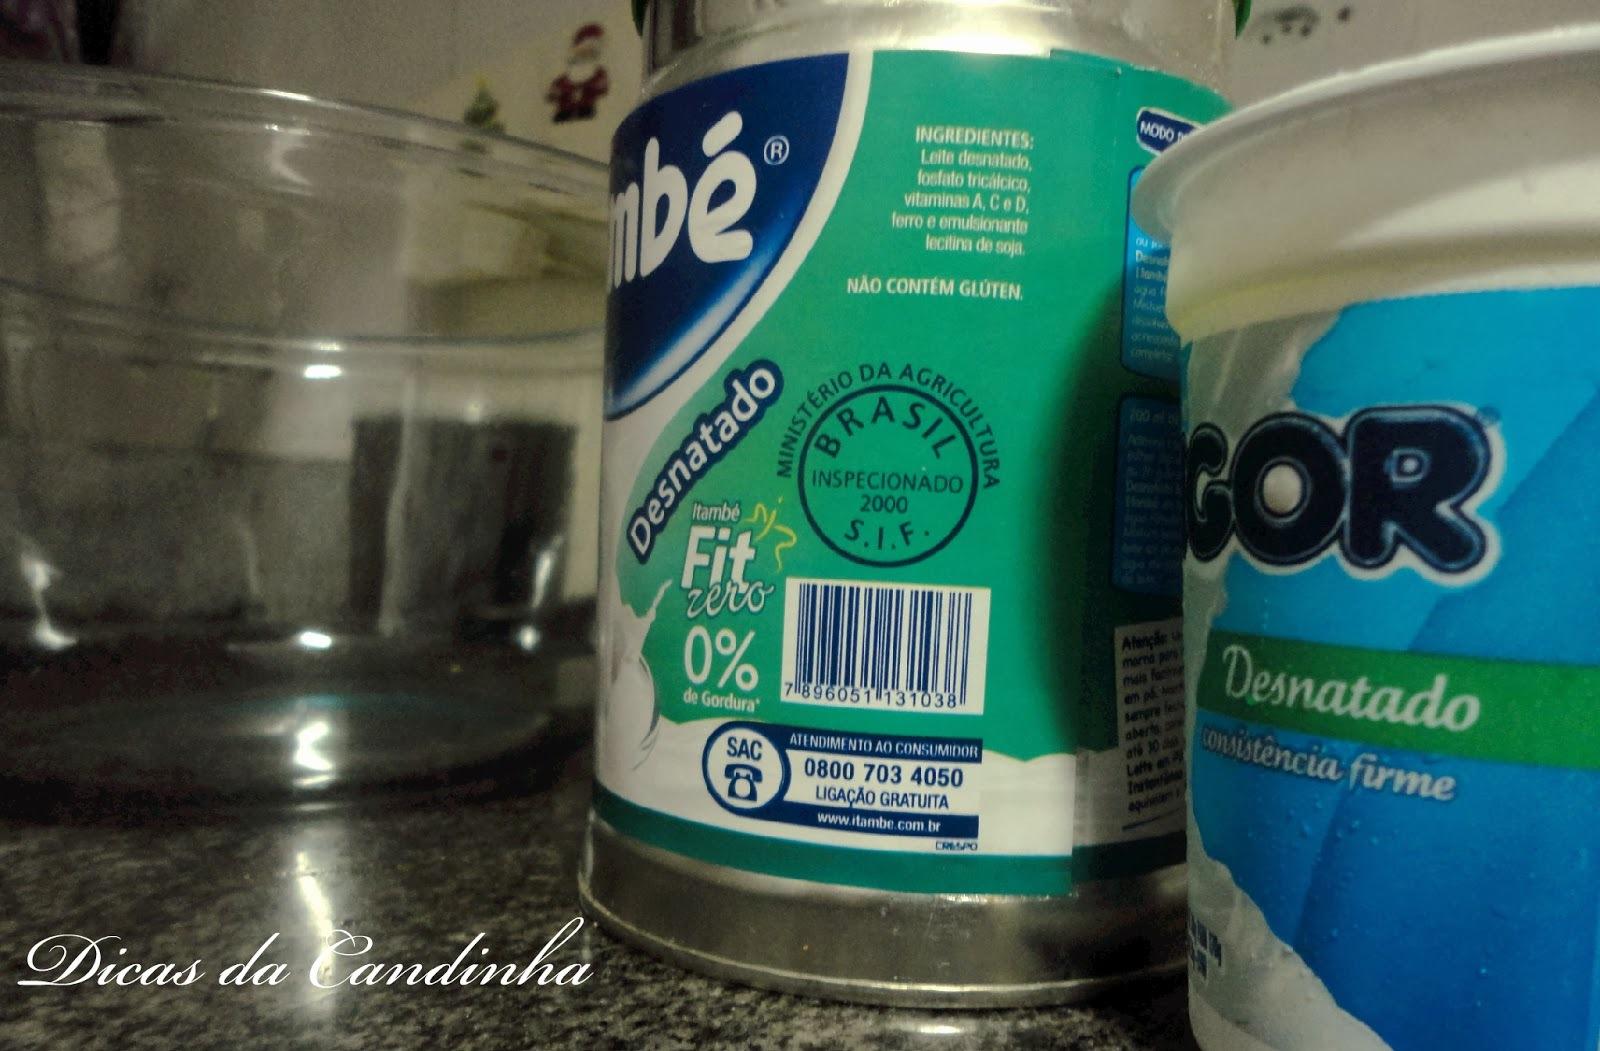 patês de iogurte